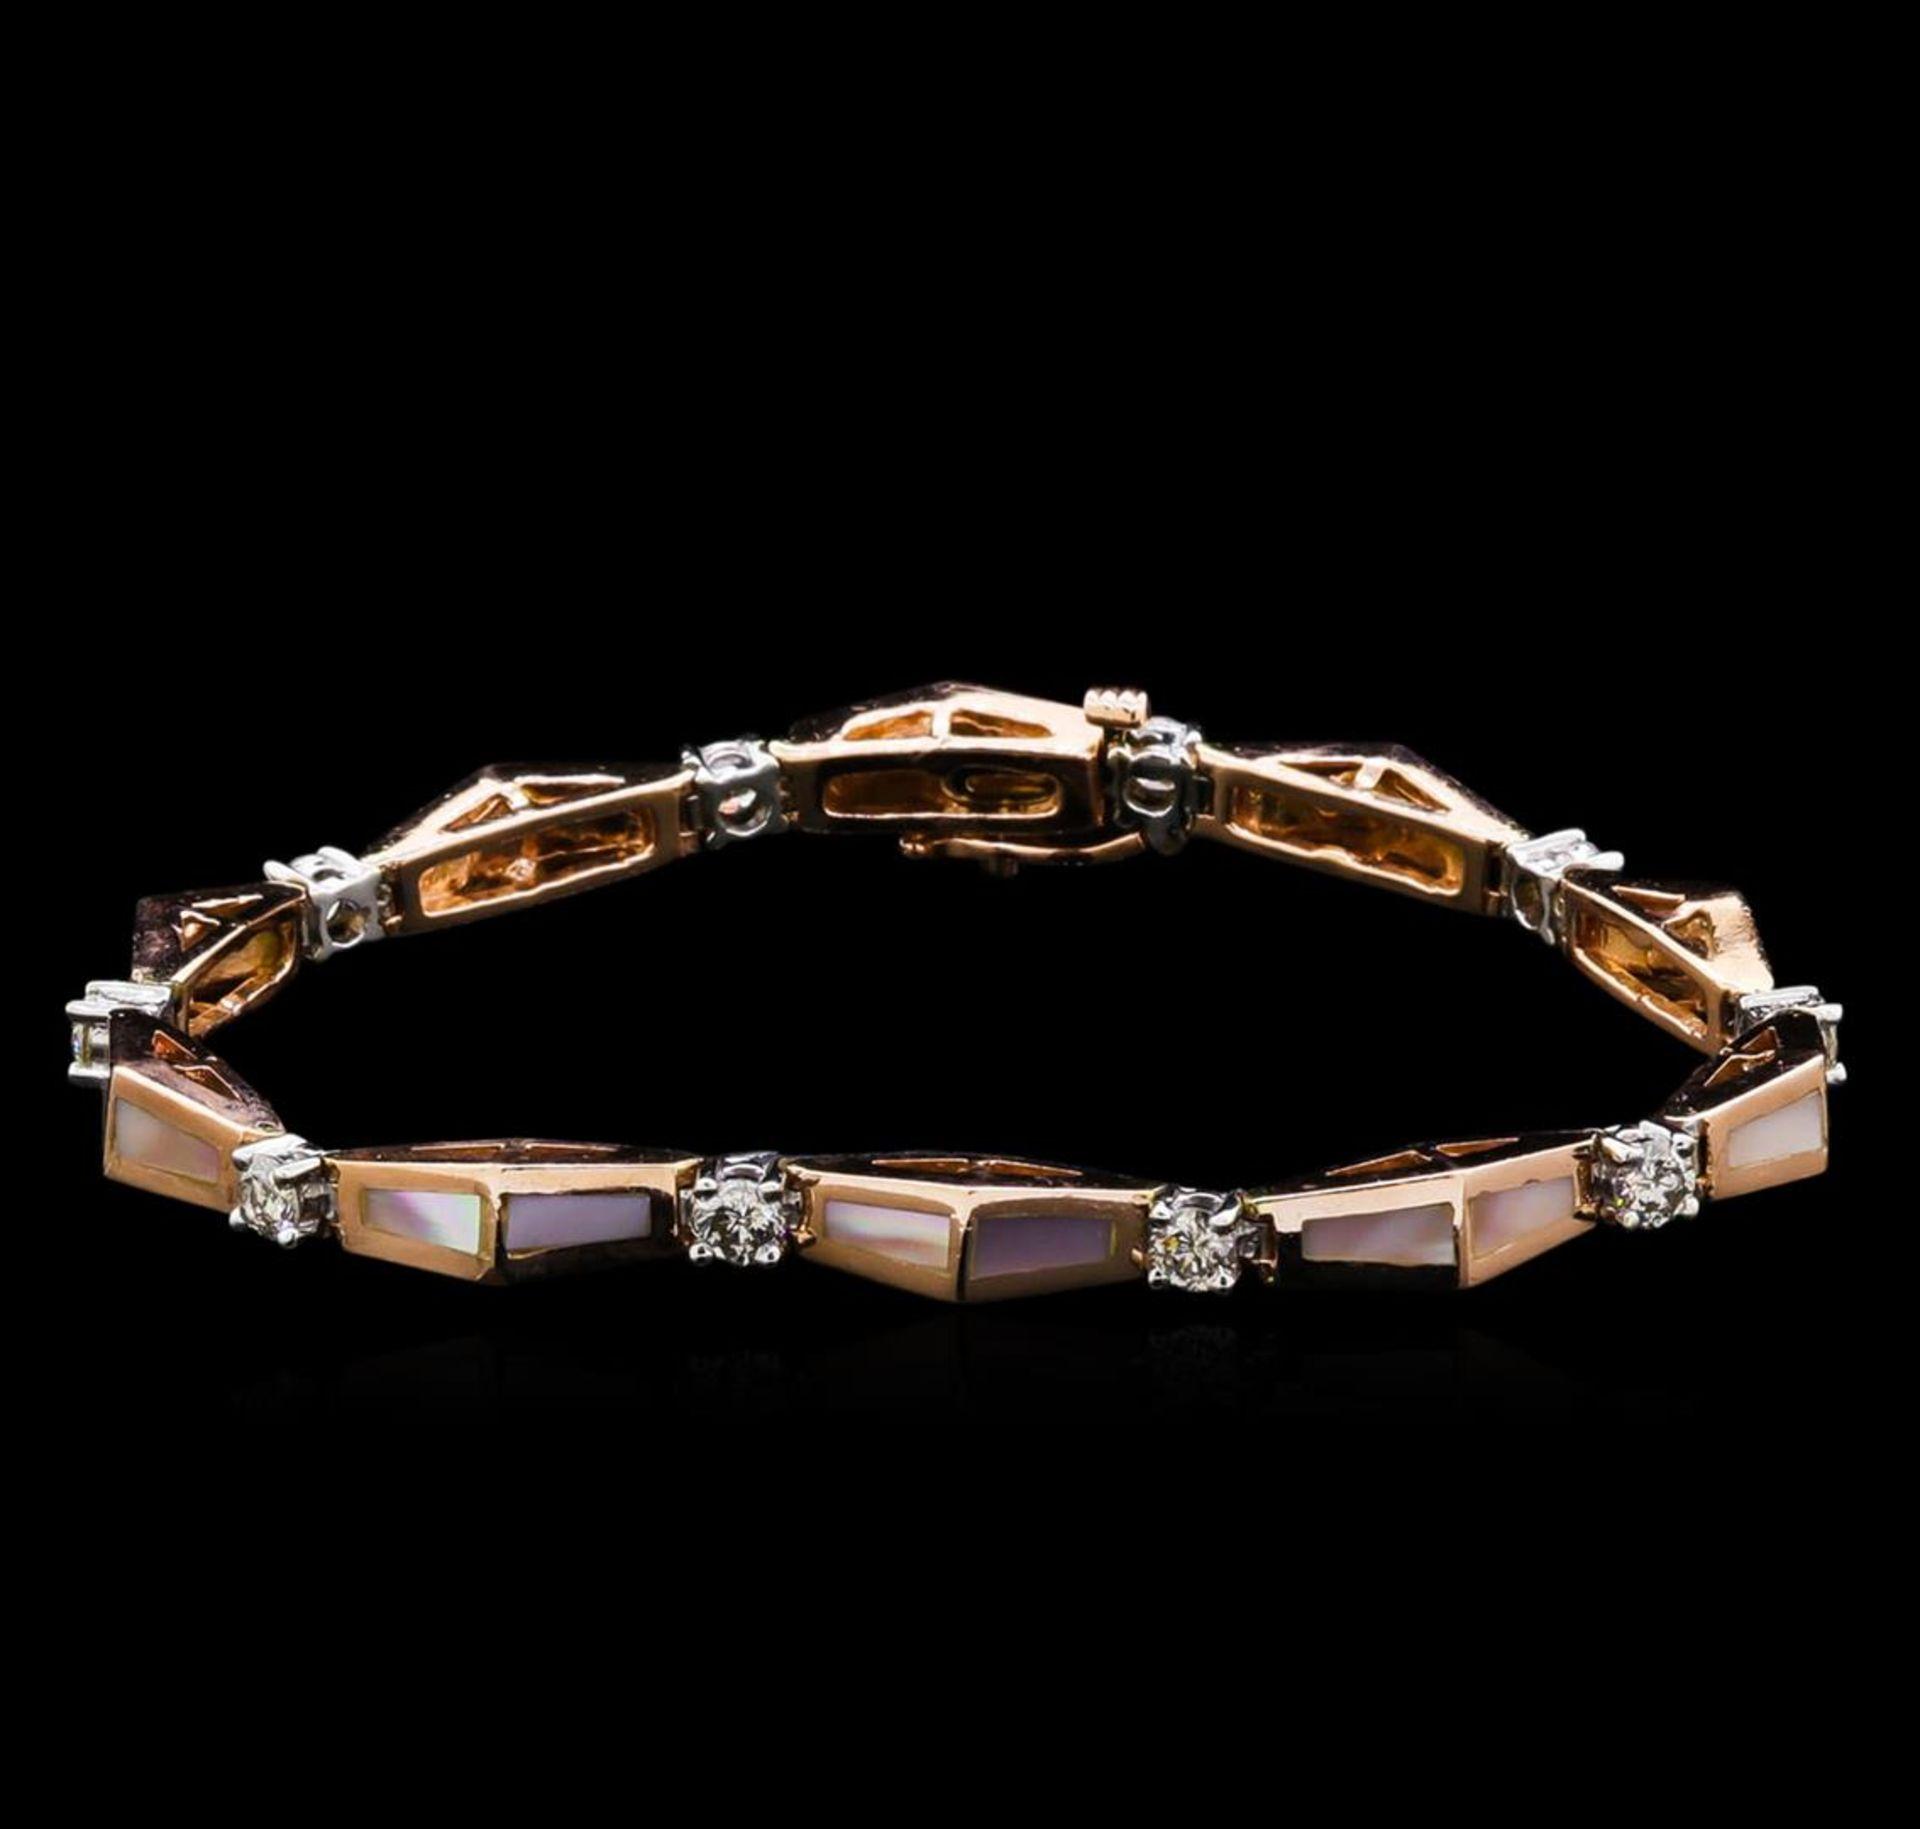 14KT Two-Tone Gold 0.67 ctw Diamond Bracelet